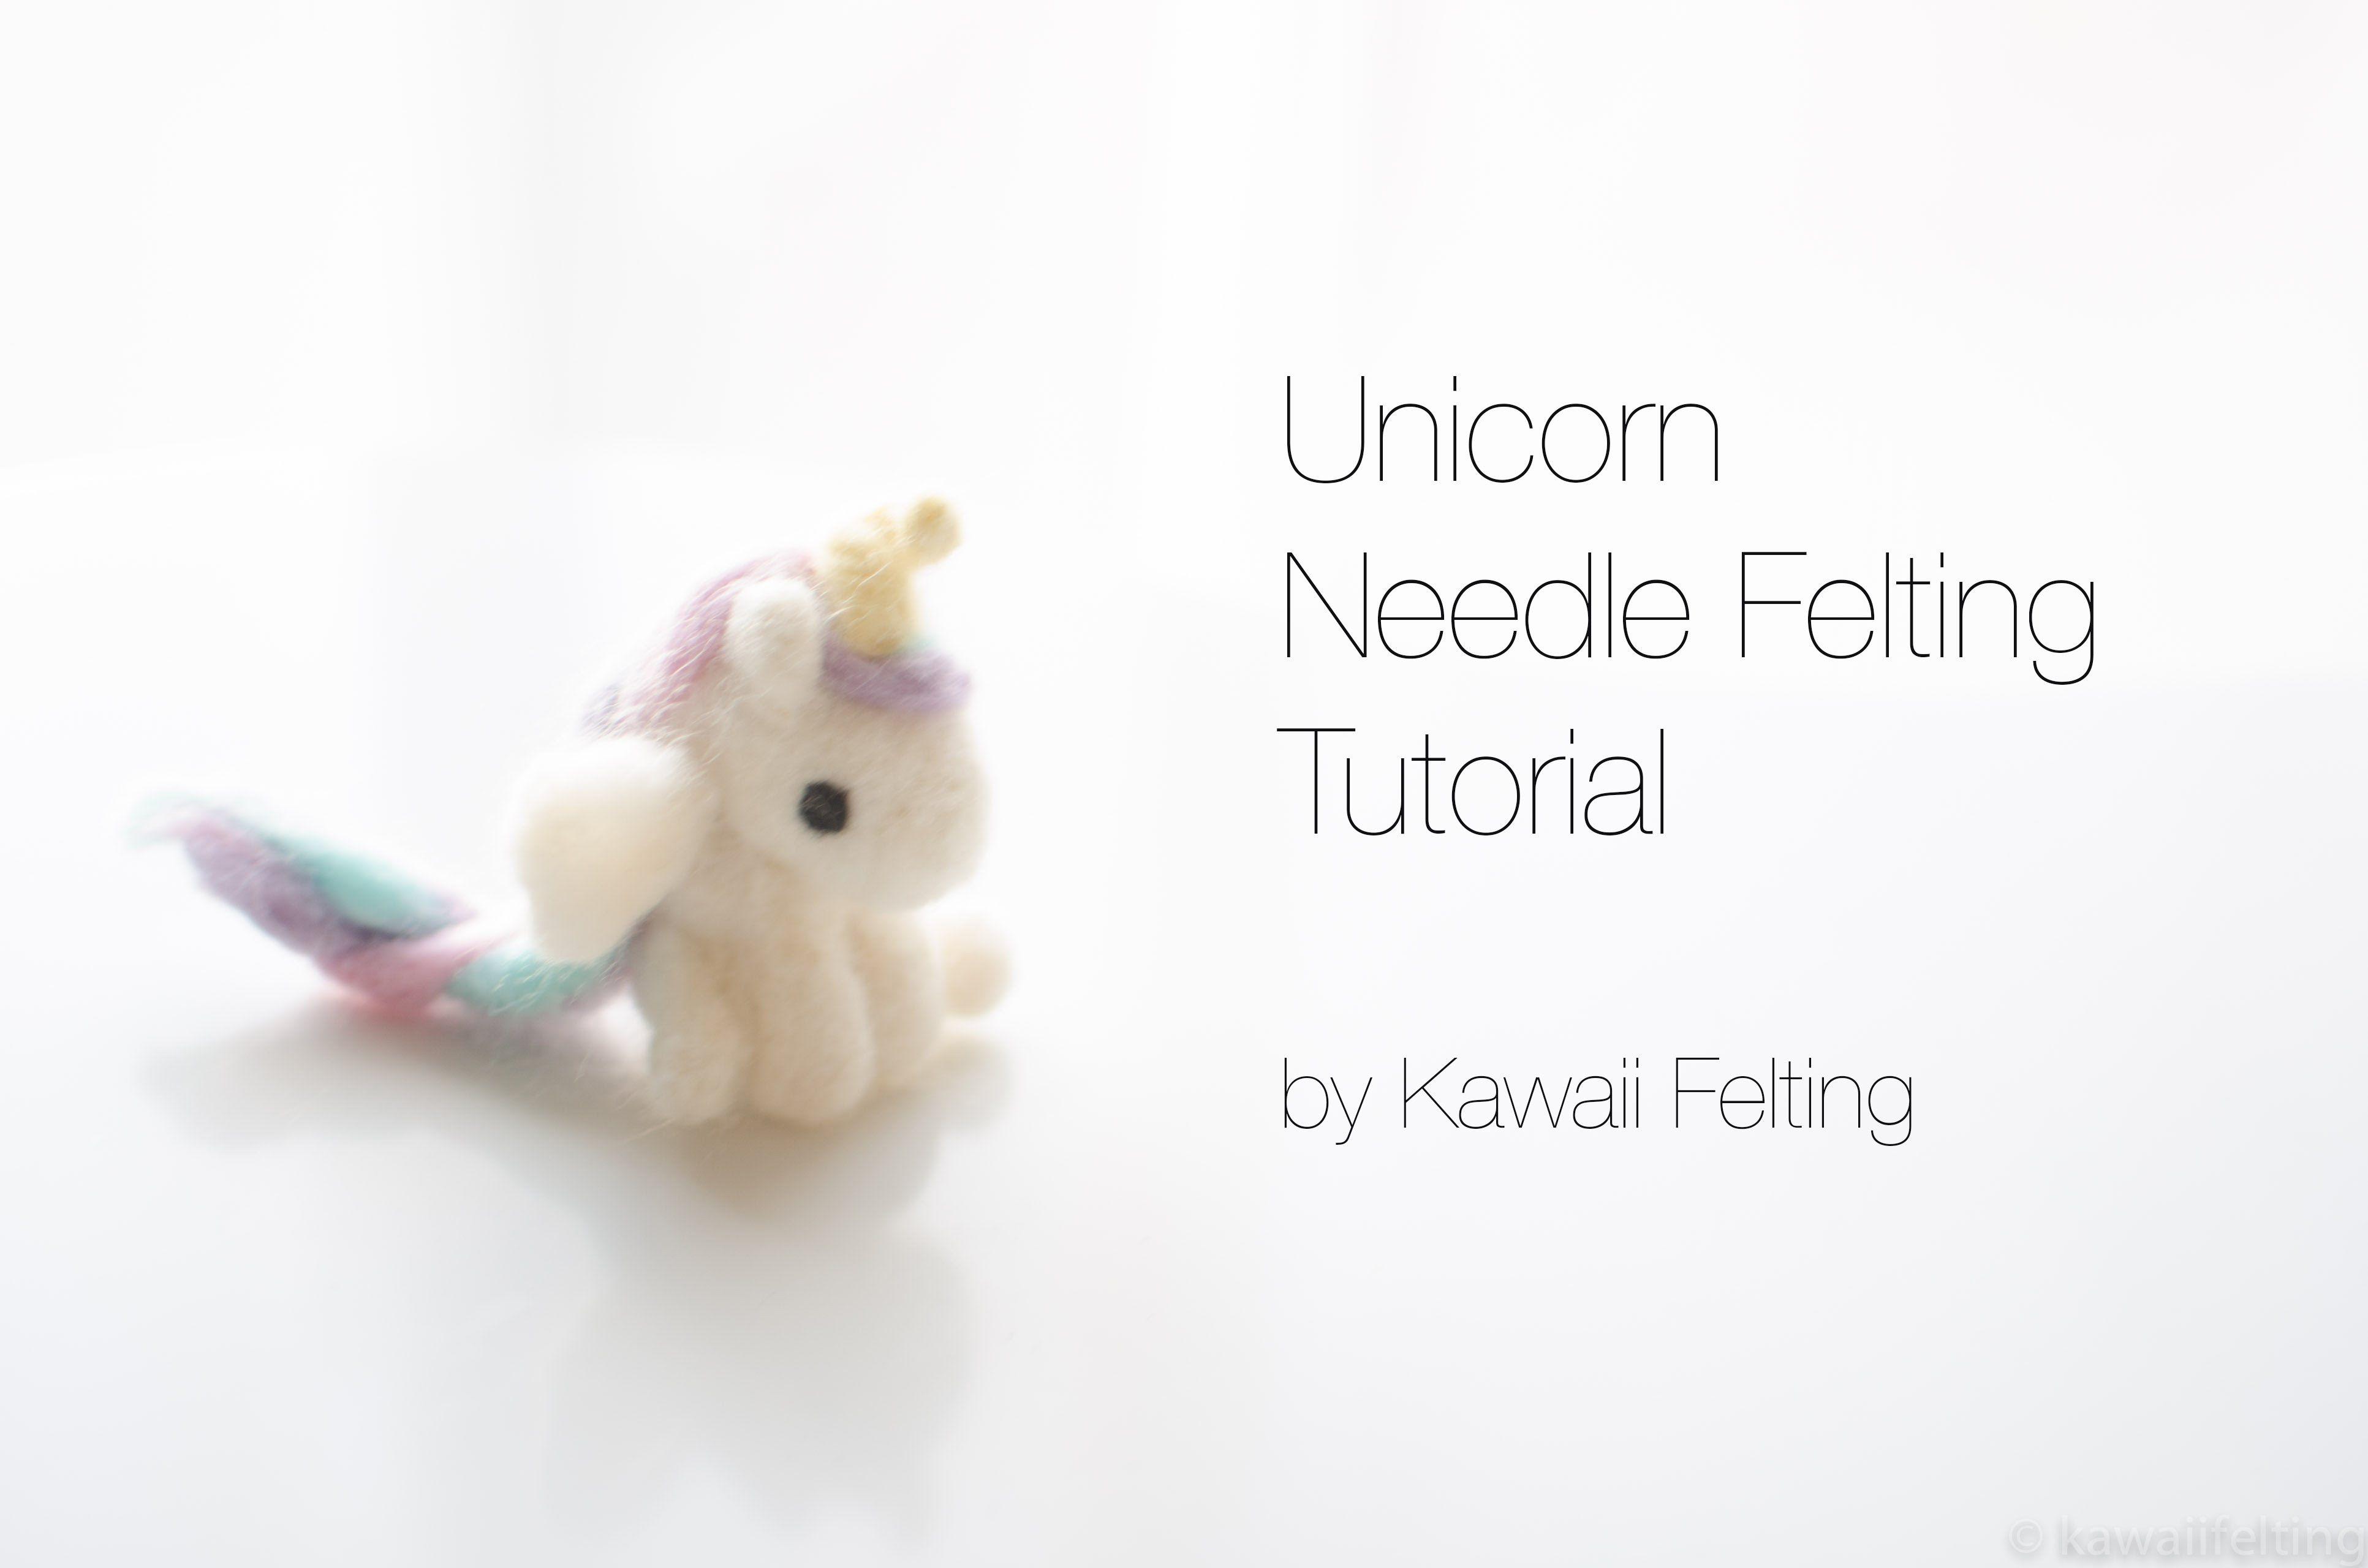 Unicorn Needle Felting Tutorial DIY (한글자막 CC~ 니들펠트) - YouTube